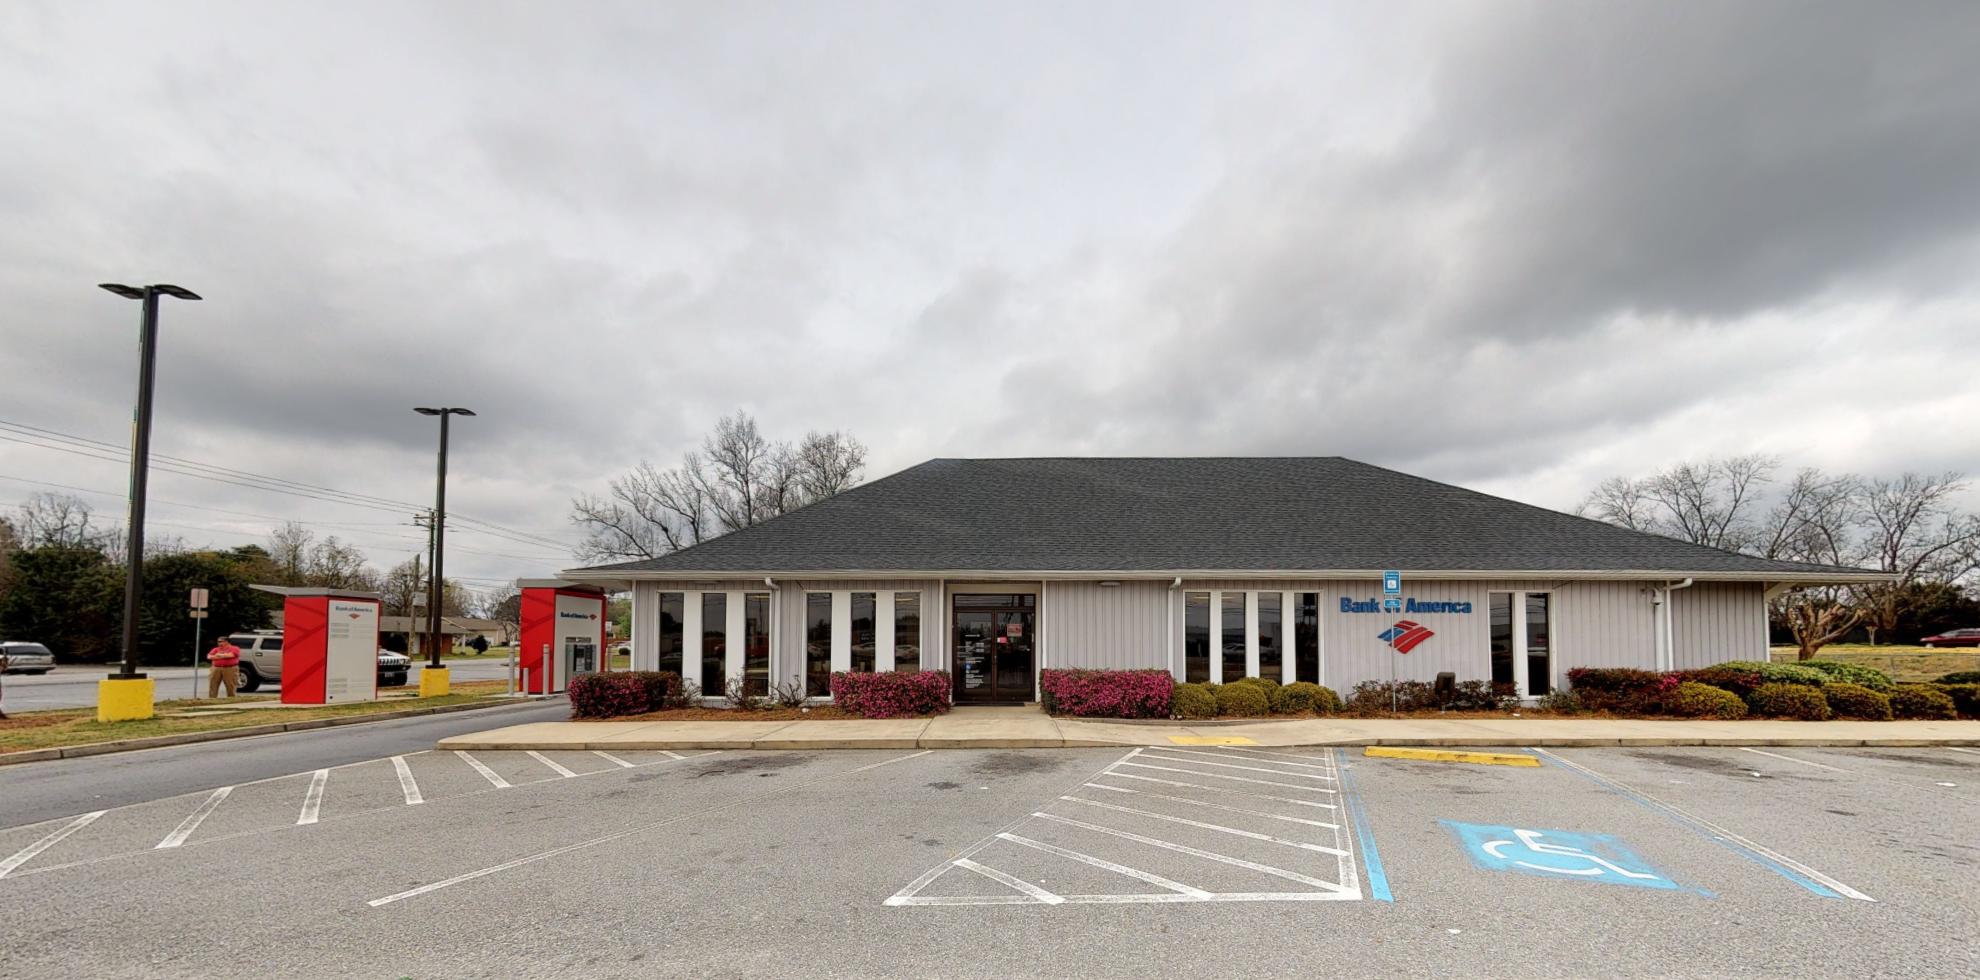 Bank of America financial center with drive-thru ATM | 2770 Watson Blvd, Centerville, GA 31028